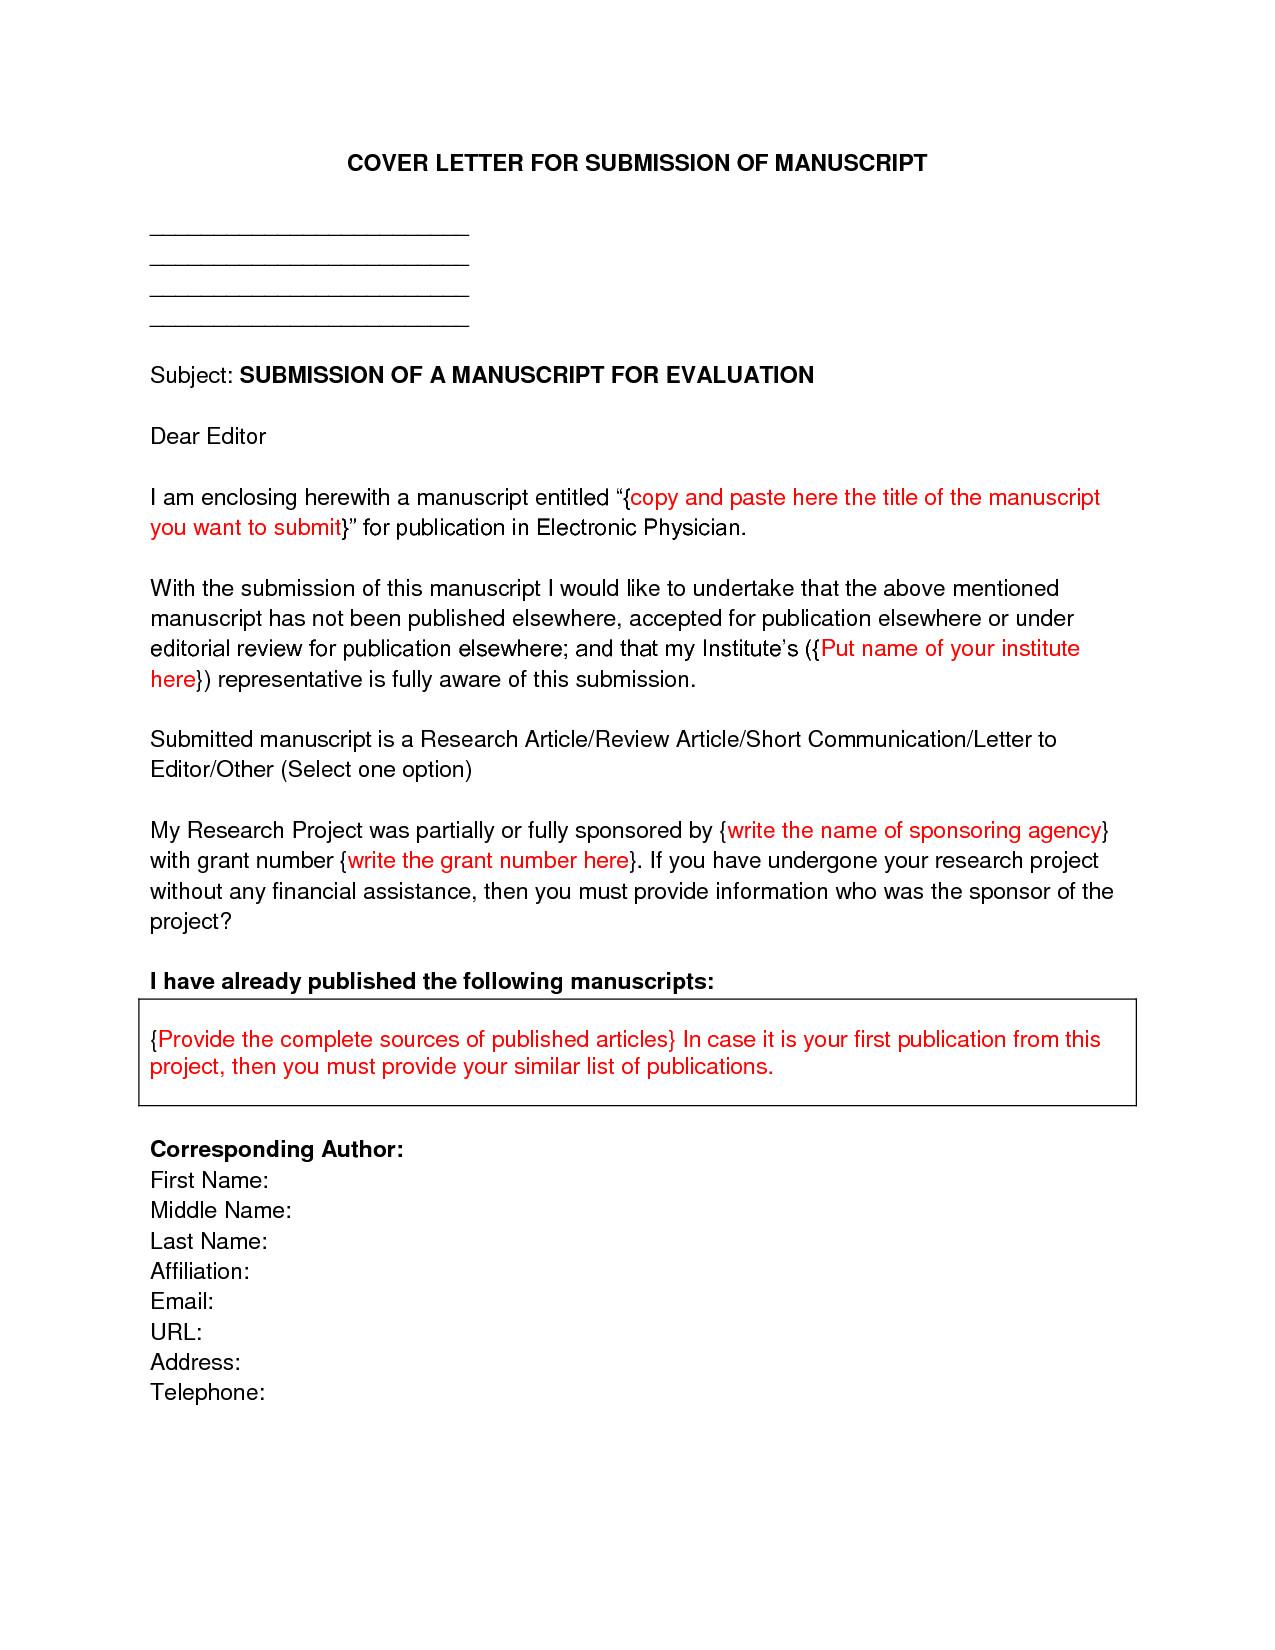 manuscript cover letter sample